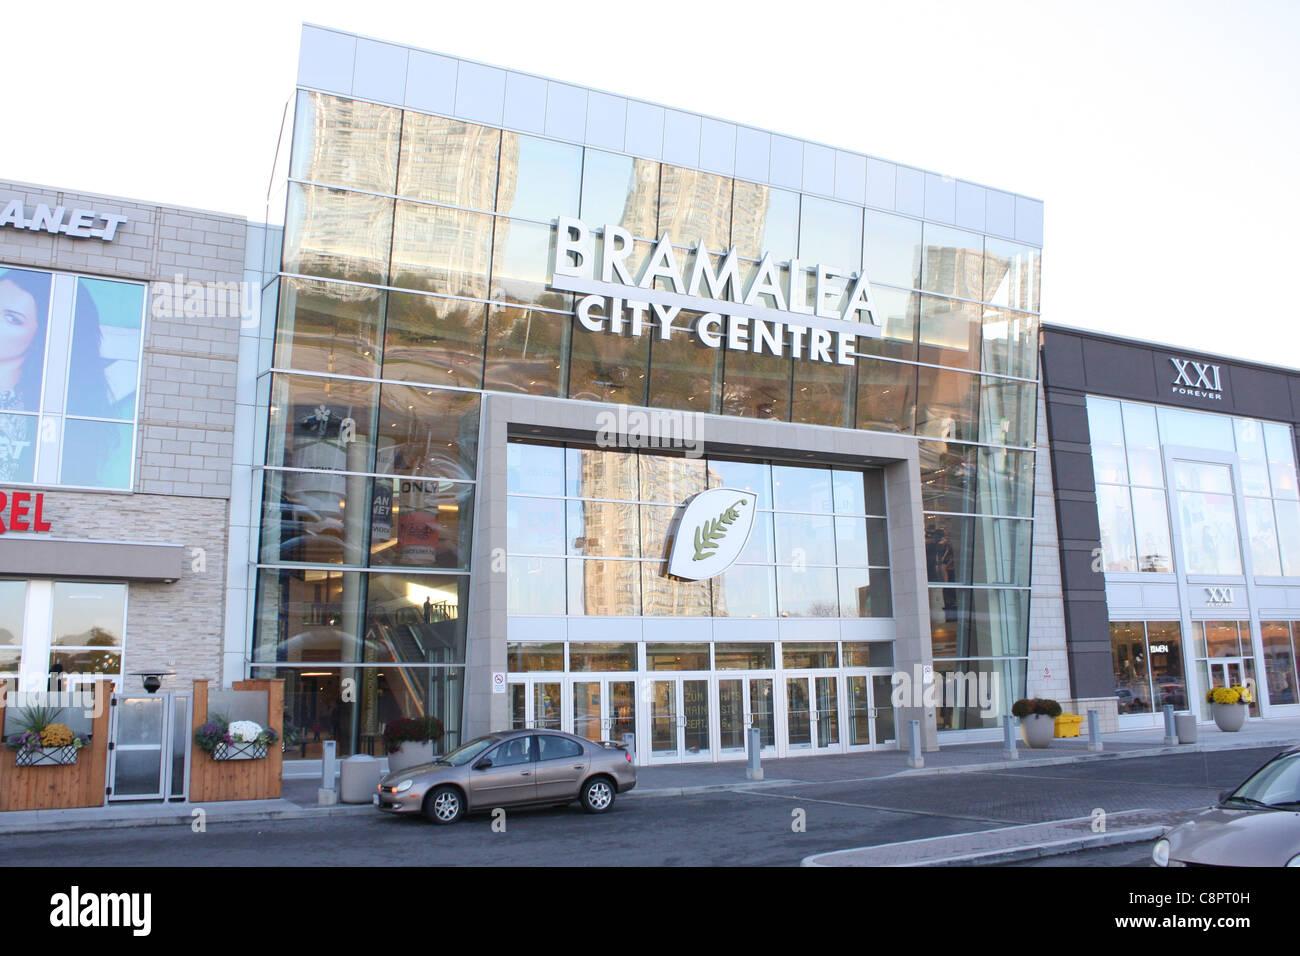 Brampton (Ontario) malls and shopping centres. The biggest Brampton shopping mall: Bramalea City Centre. The biggest Ontario shopping mall: Brampton Mall in Brampton. Main St S, Brampton, Ontario, L6W 2C9. 23 stores Bramrose Square in Brampton. Queen St E, Brampton.